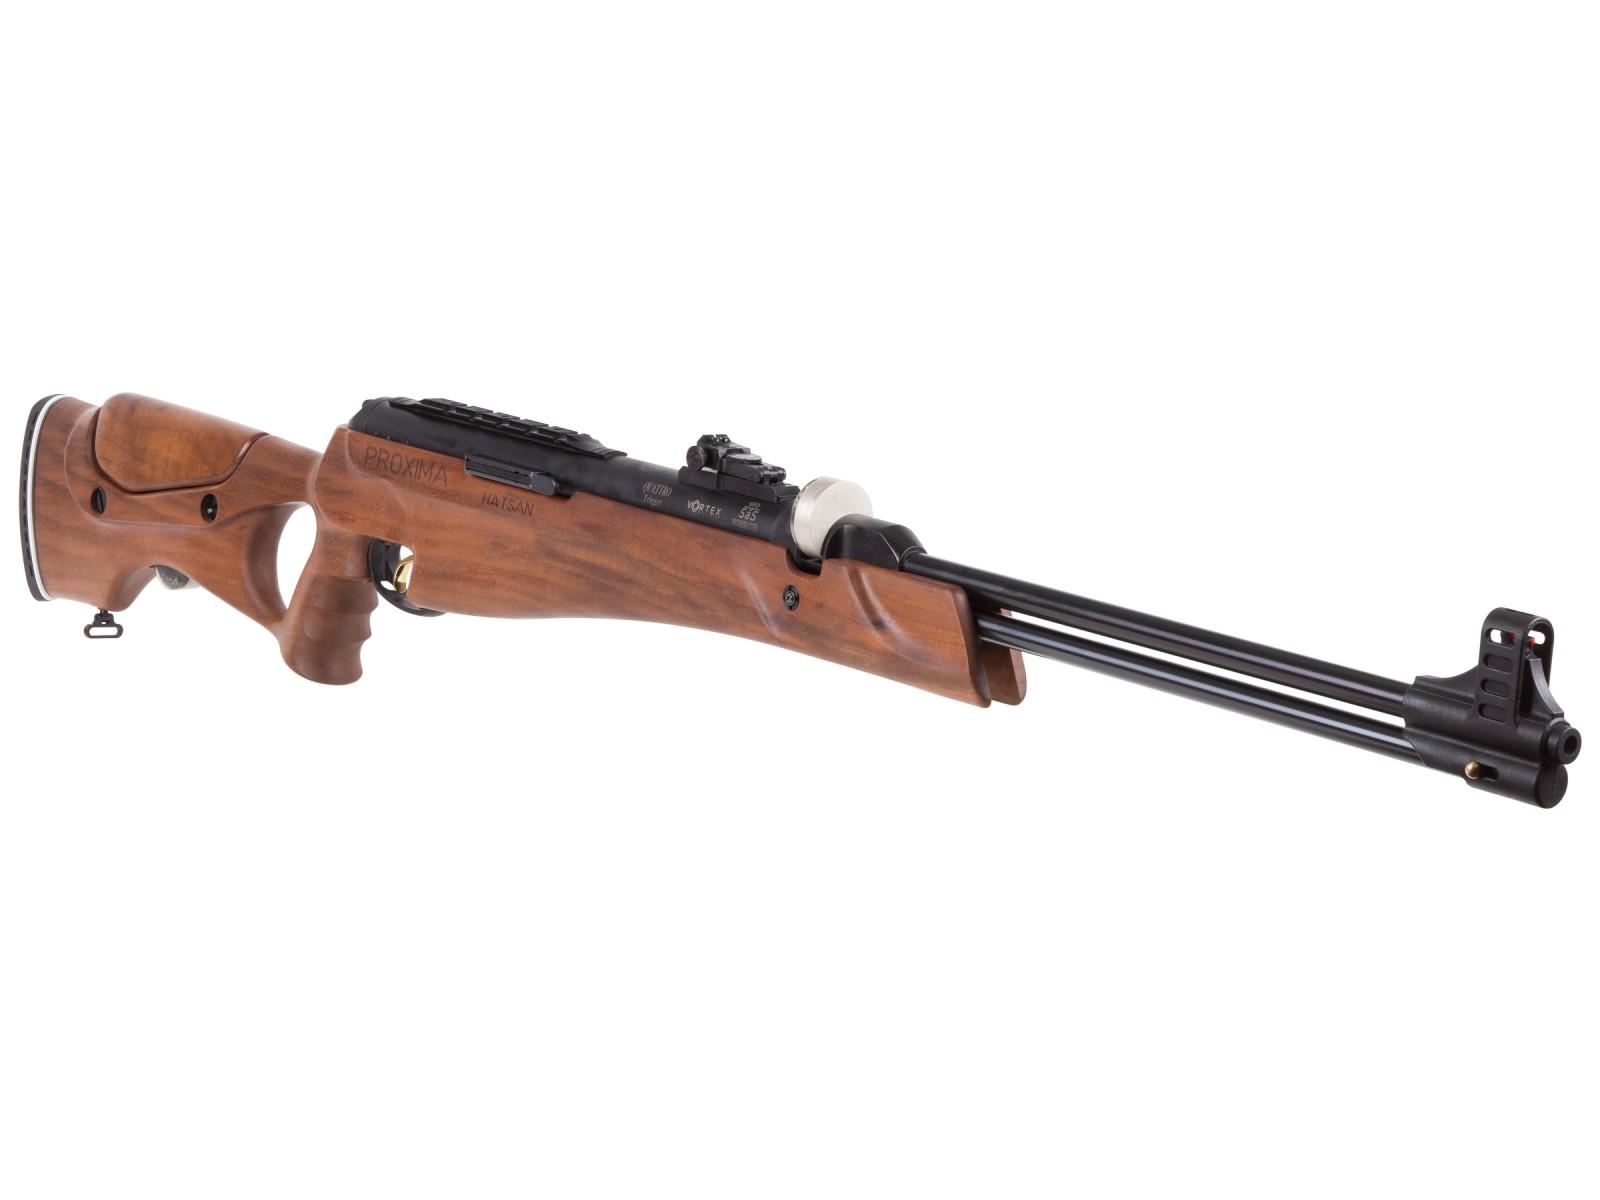 Proxima Multishot Underlever Air Rifle